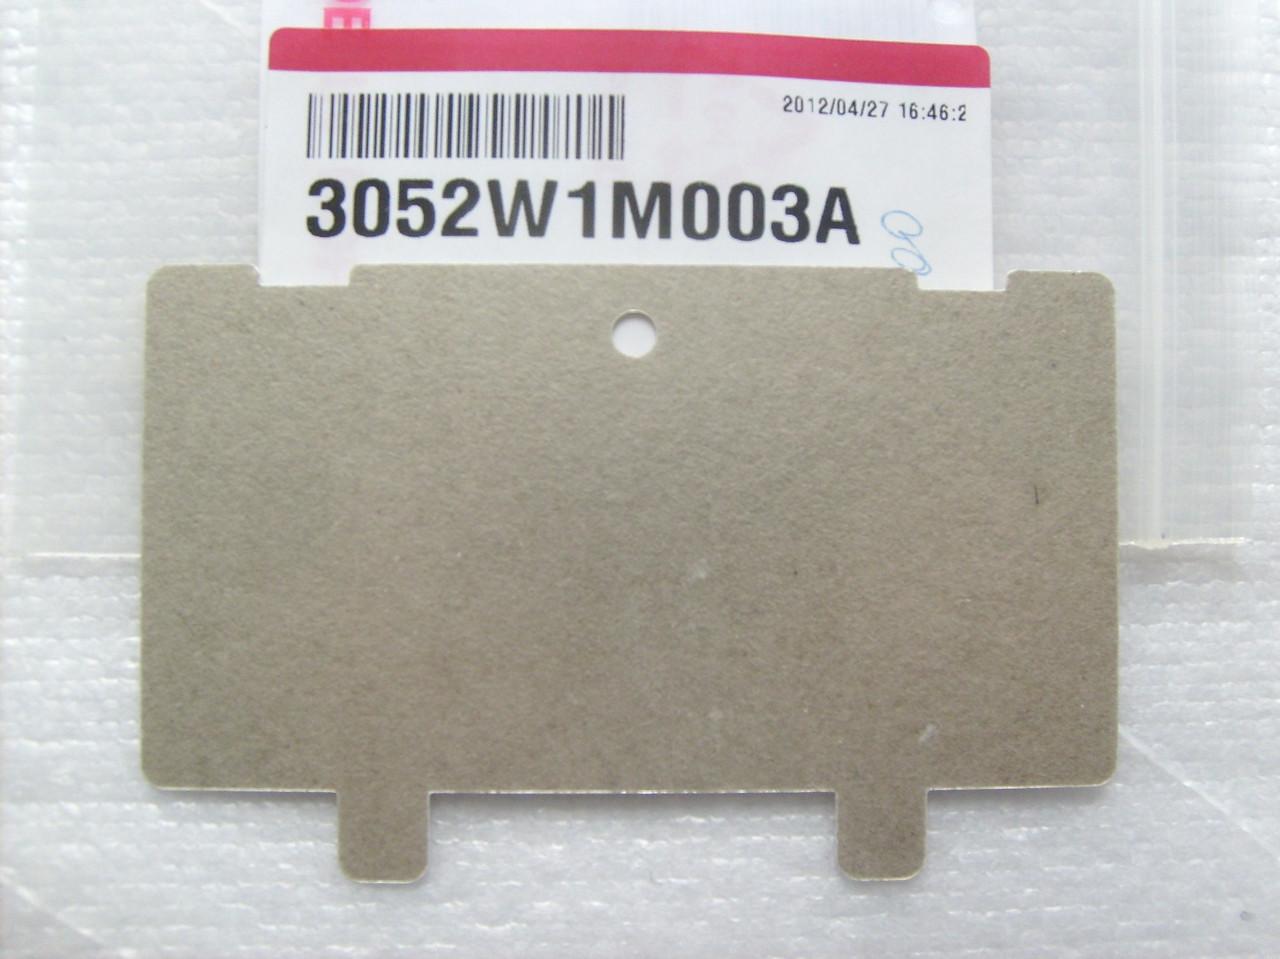 Защитная накладка для микроволновой печи LG 3052W1M003A